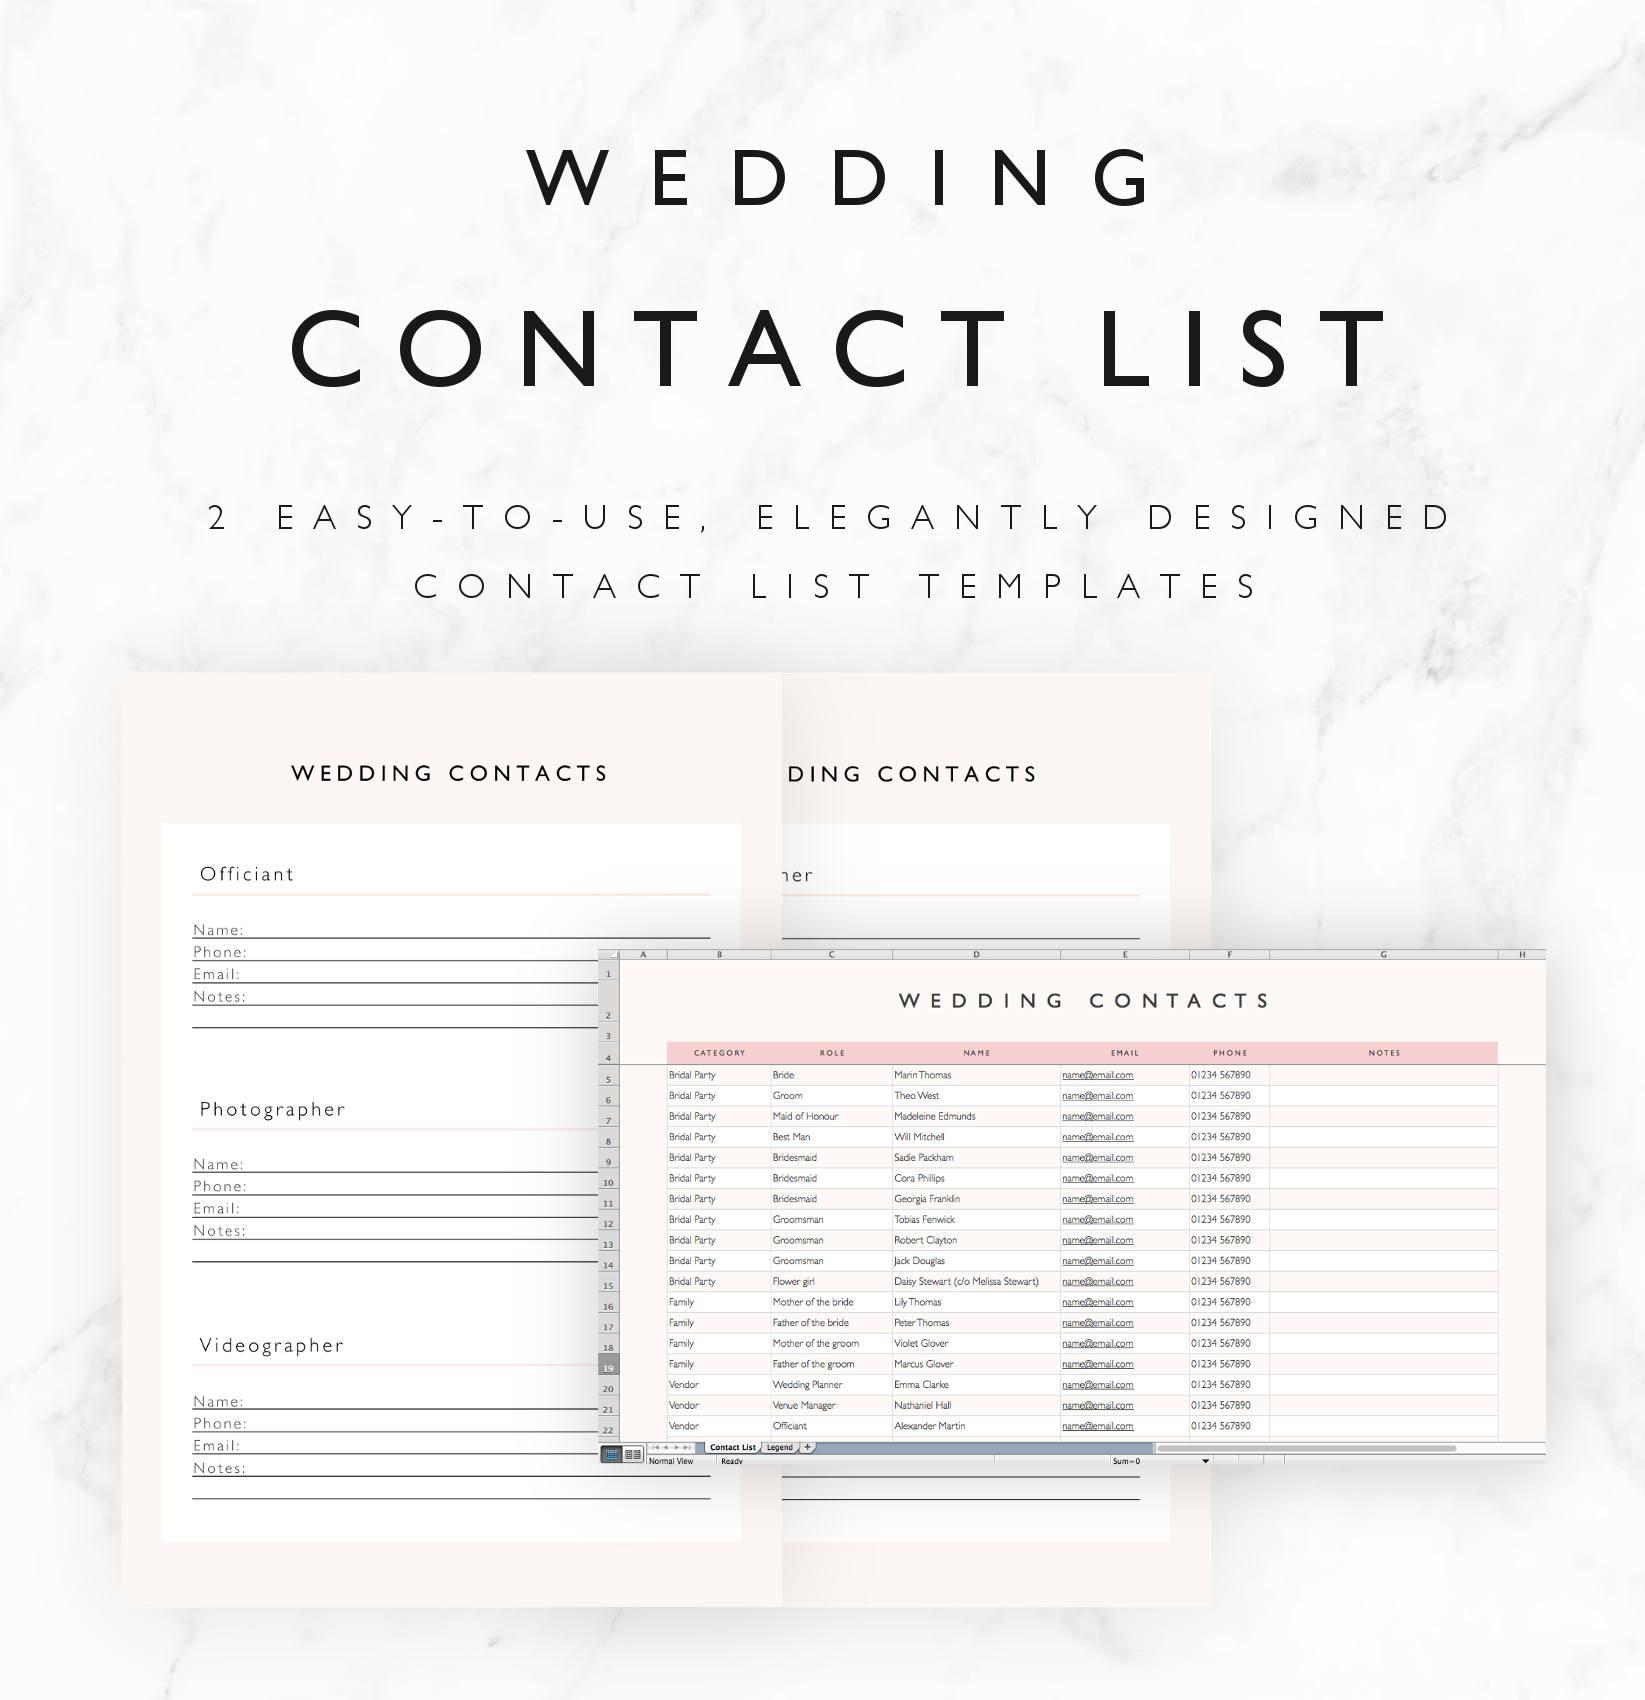 Wedding contact list template excel spreadsheet printable zoom alramifo Choice Image